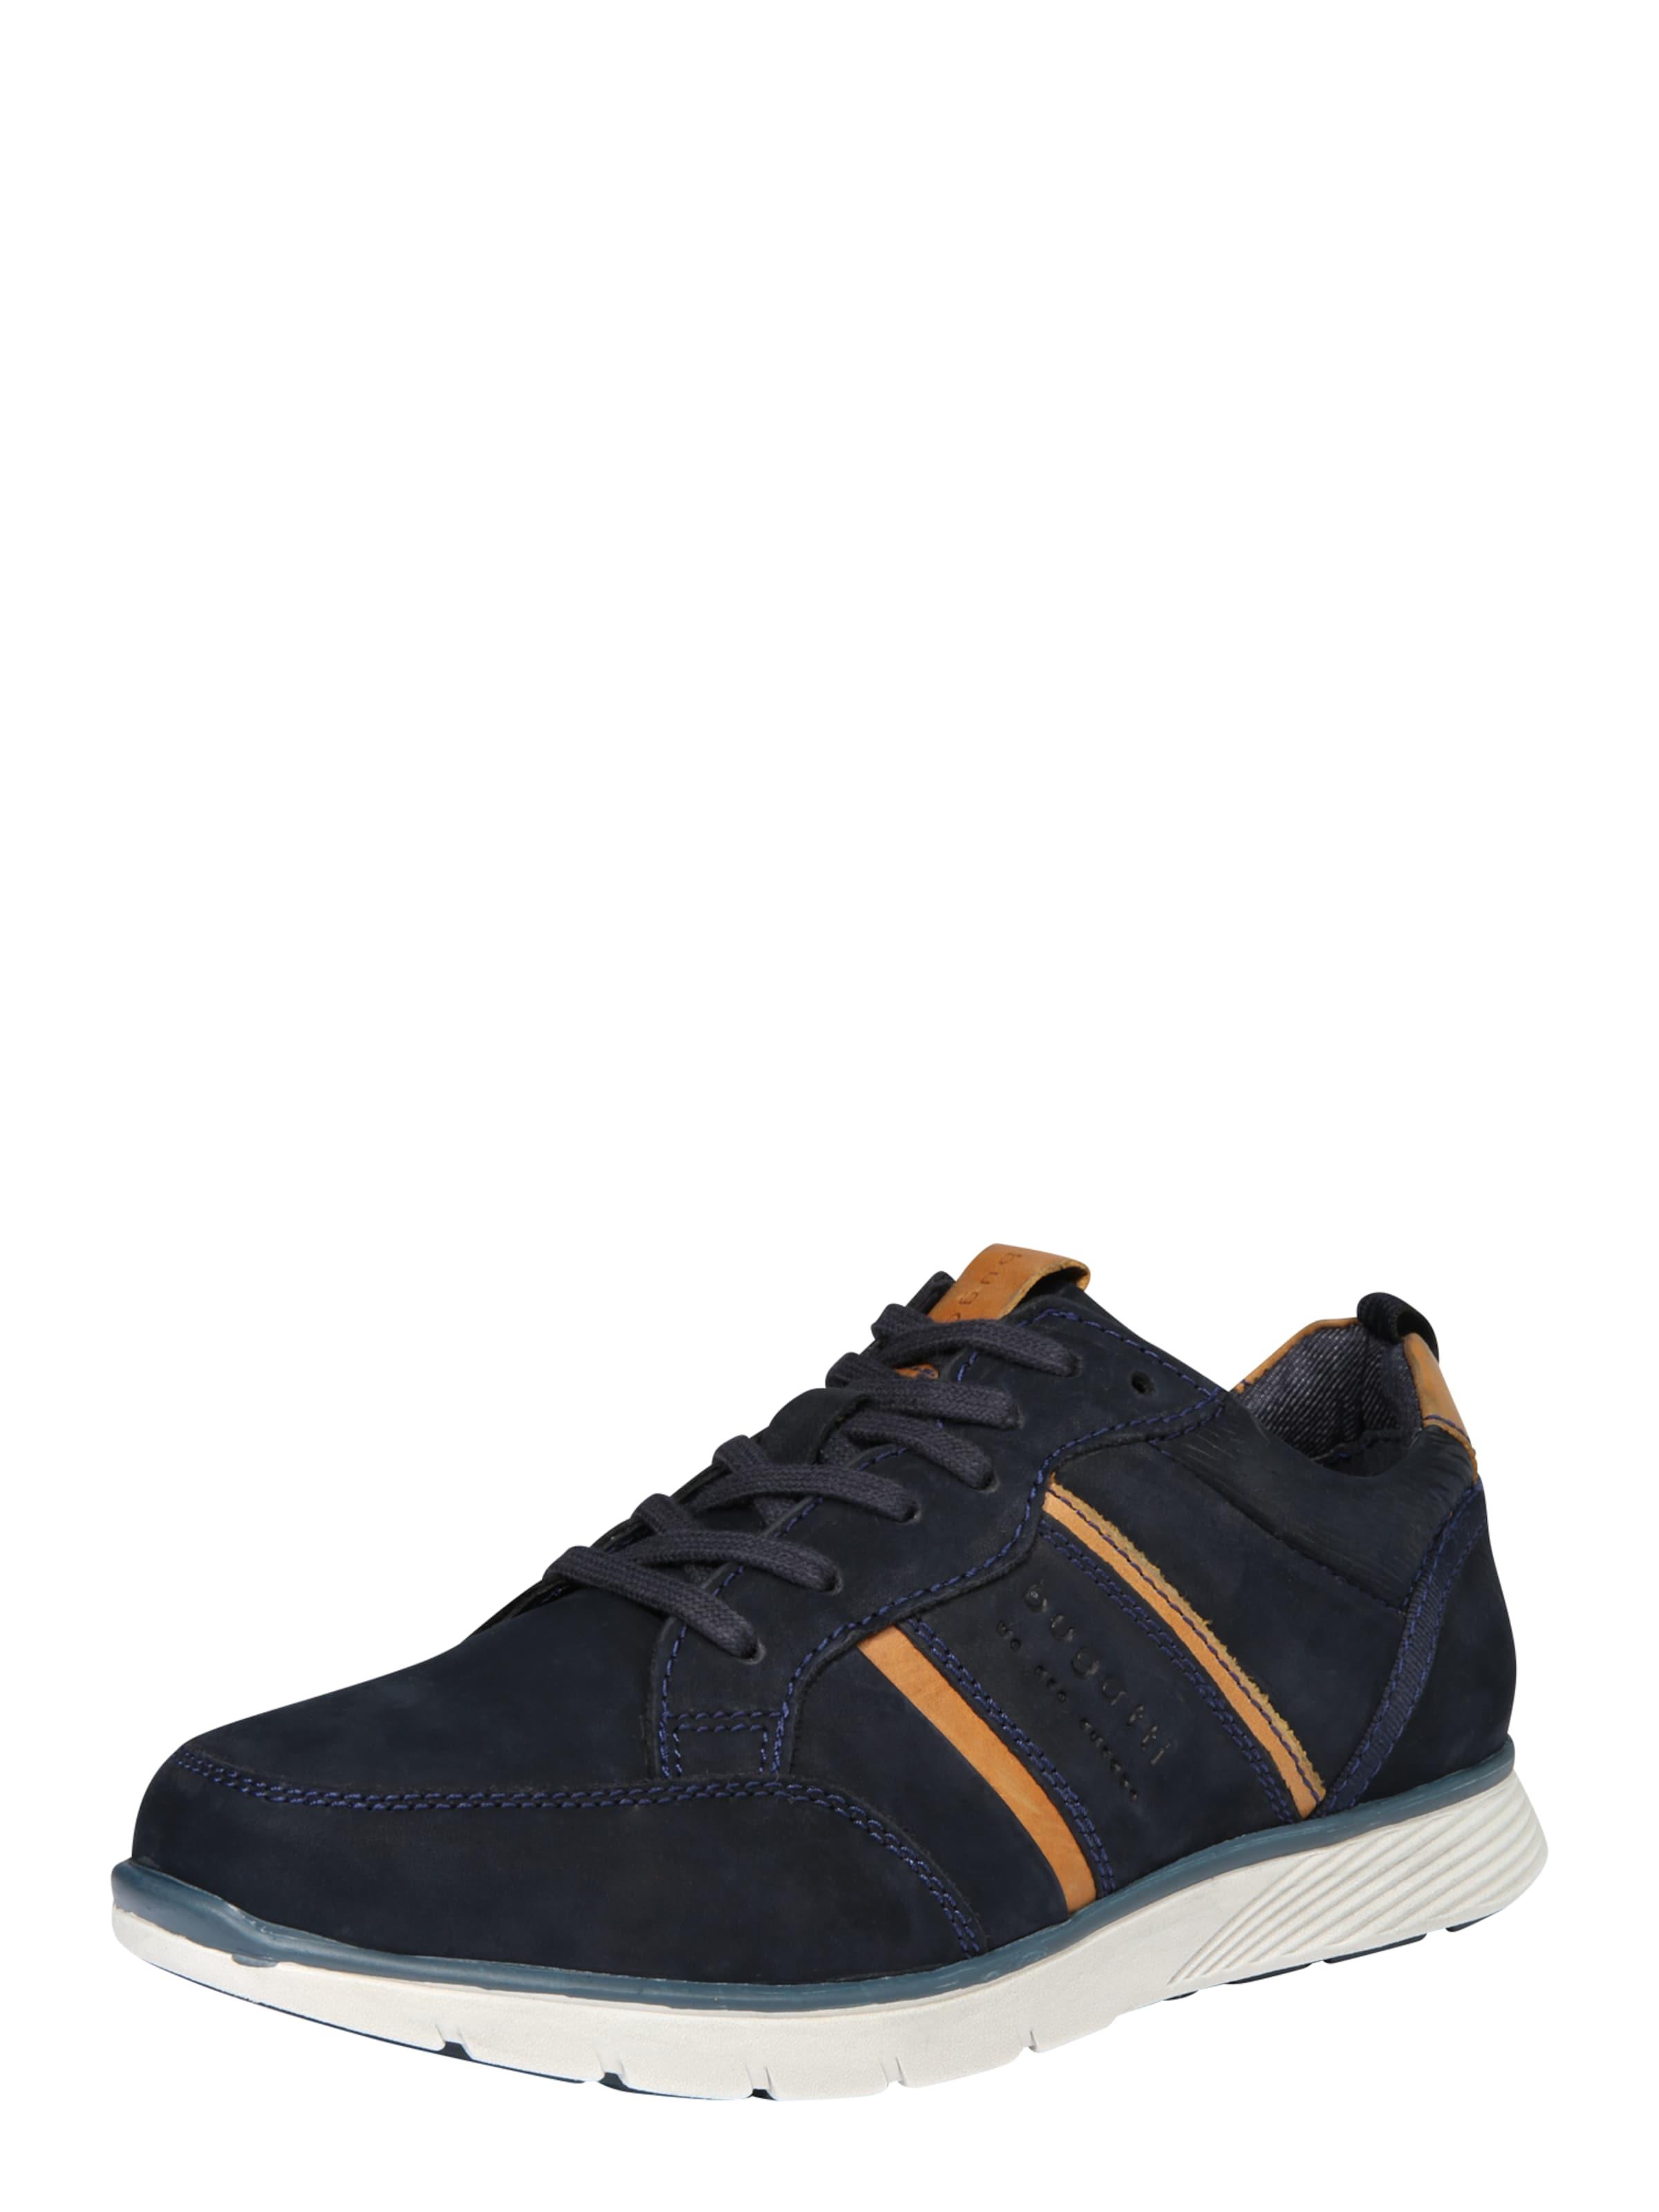 Sneaker In Bugatti DunkelblauDunkelorange Weiß 'oak' hQtCBrsdx